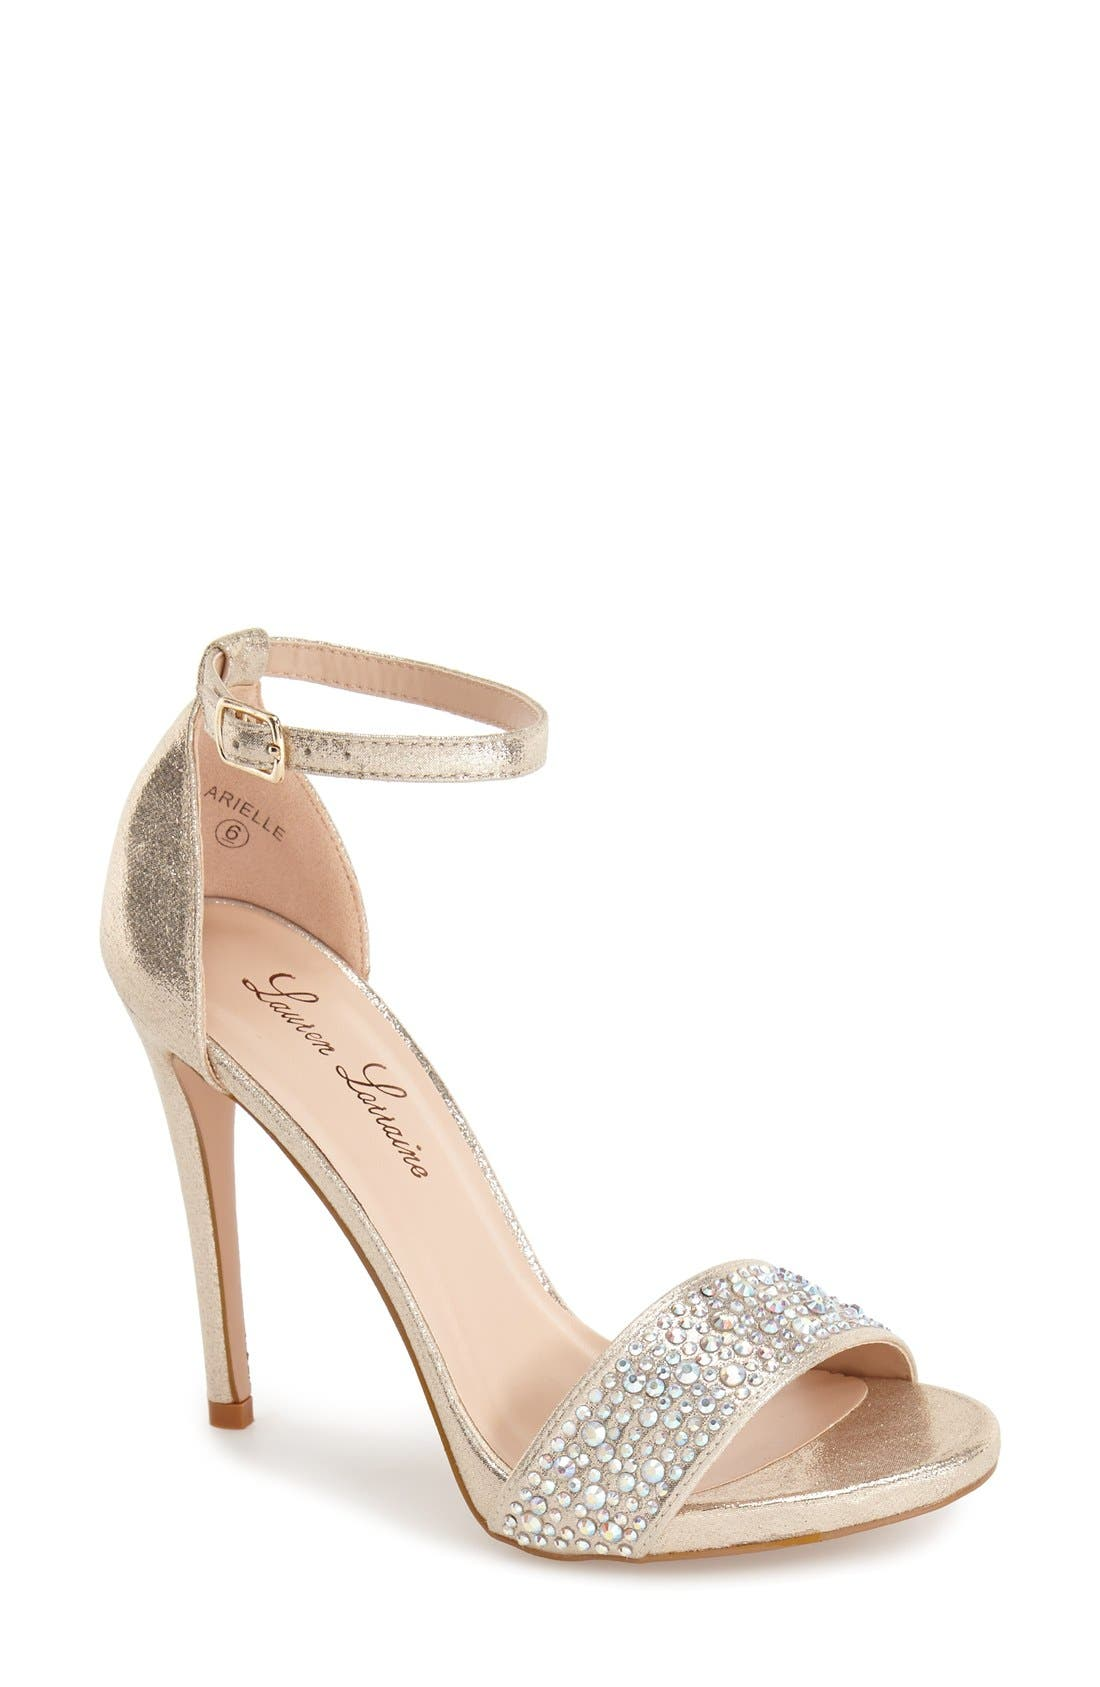 Main Image - Lauren Lorraine 'Arielle' Ankle Strap Sandal (Women)